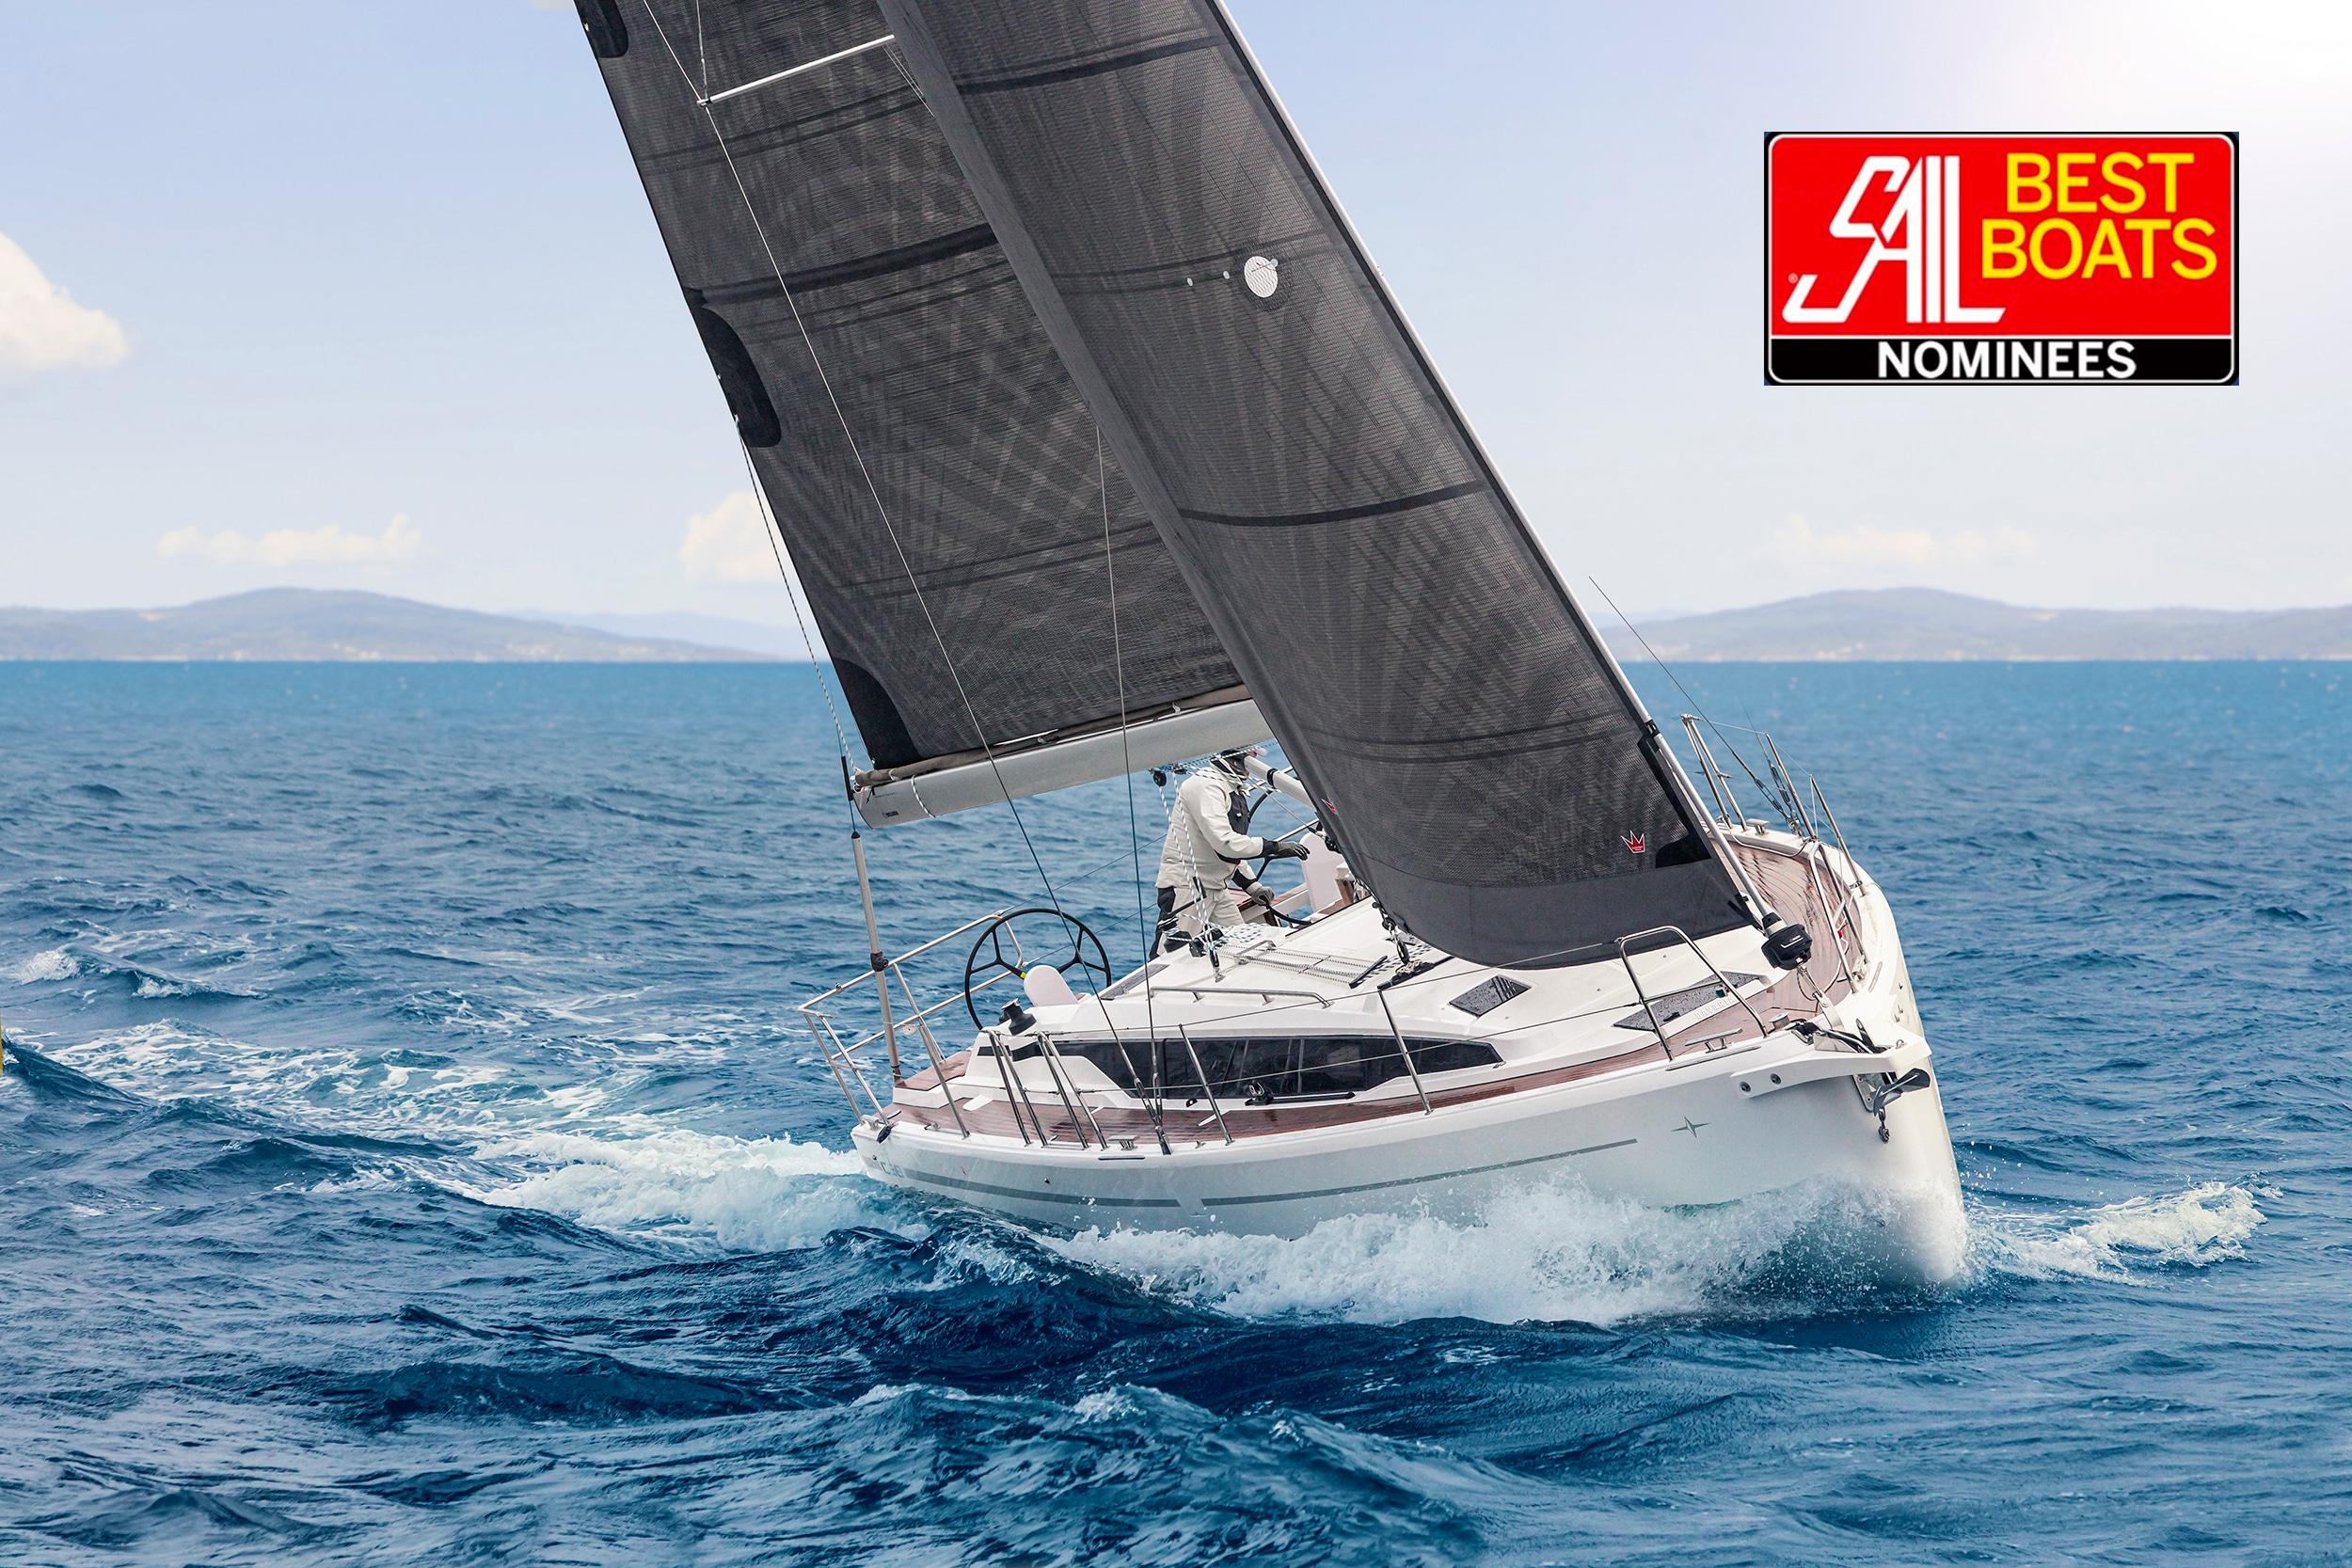 Bavaria C38 by Cossutti Yacht Design Sail's Best Boats Award nominee